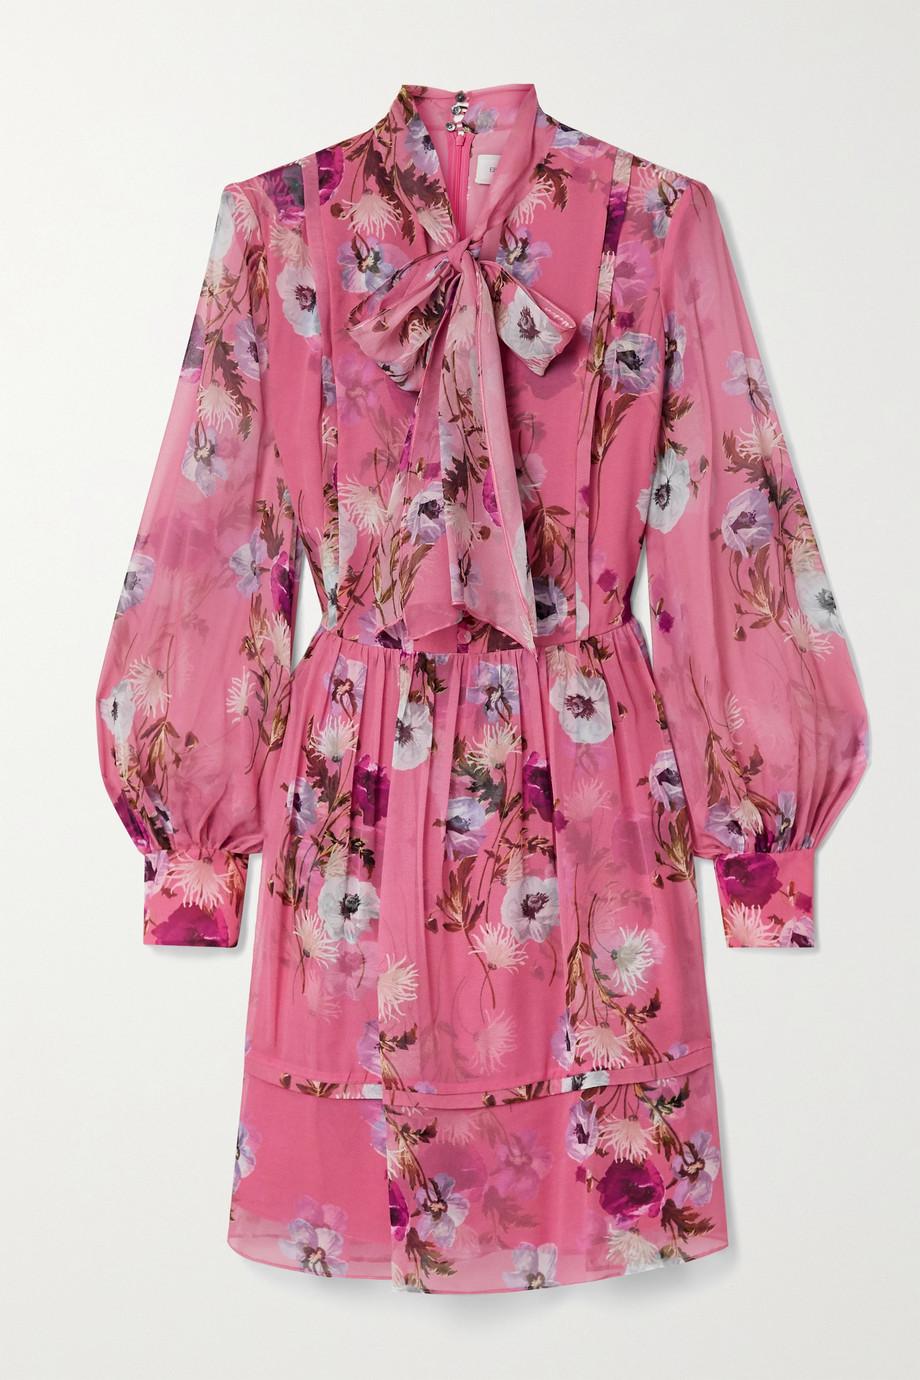 Erdem Remy pussy-bow floral-print silk crepe de chine mini dress